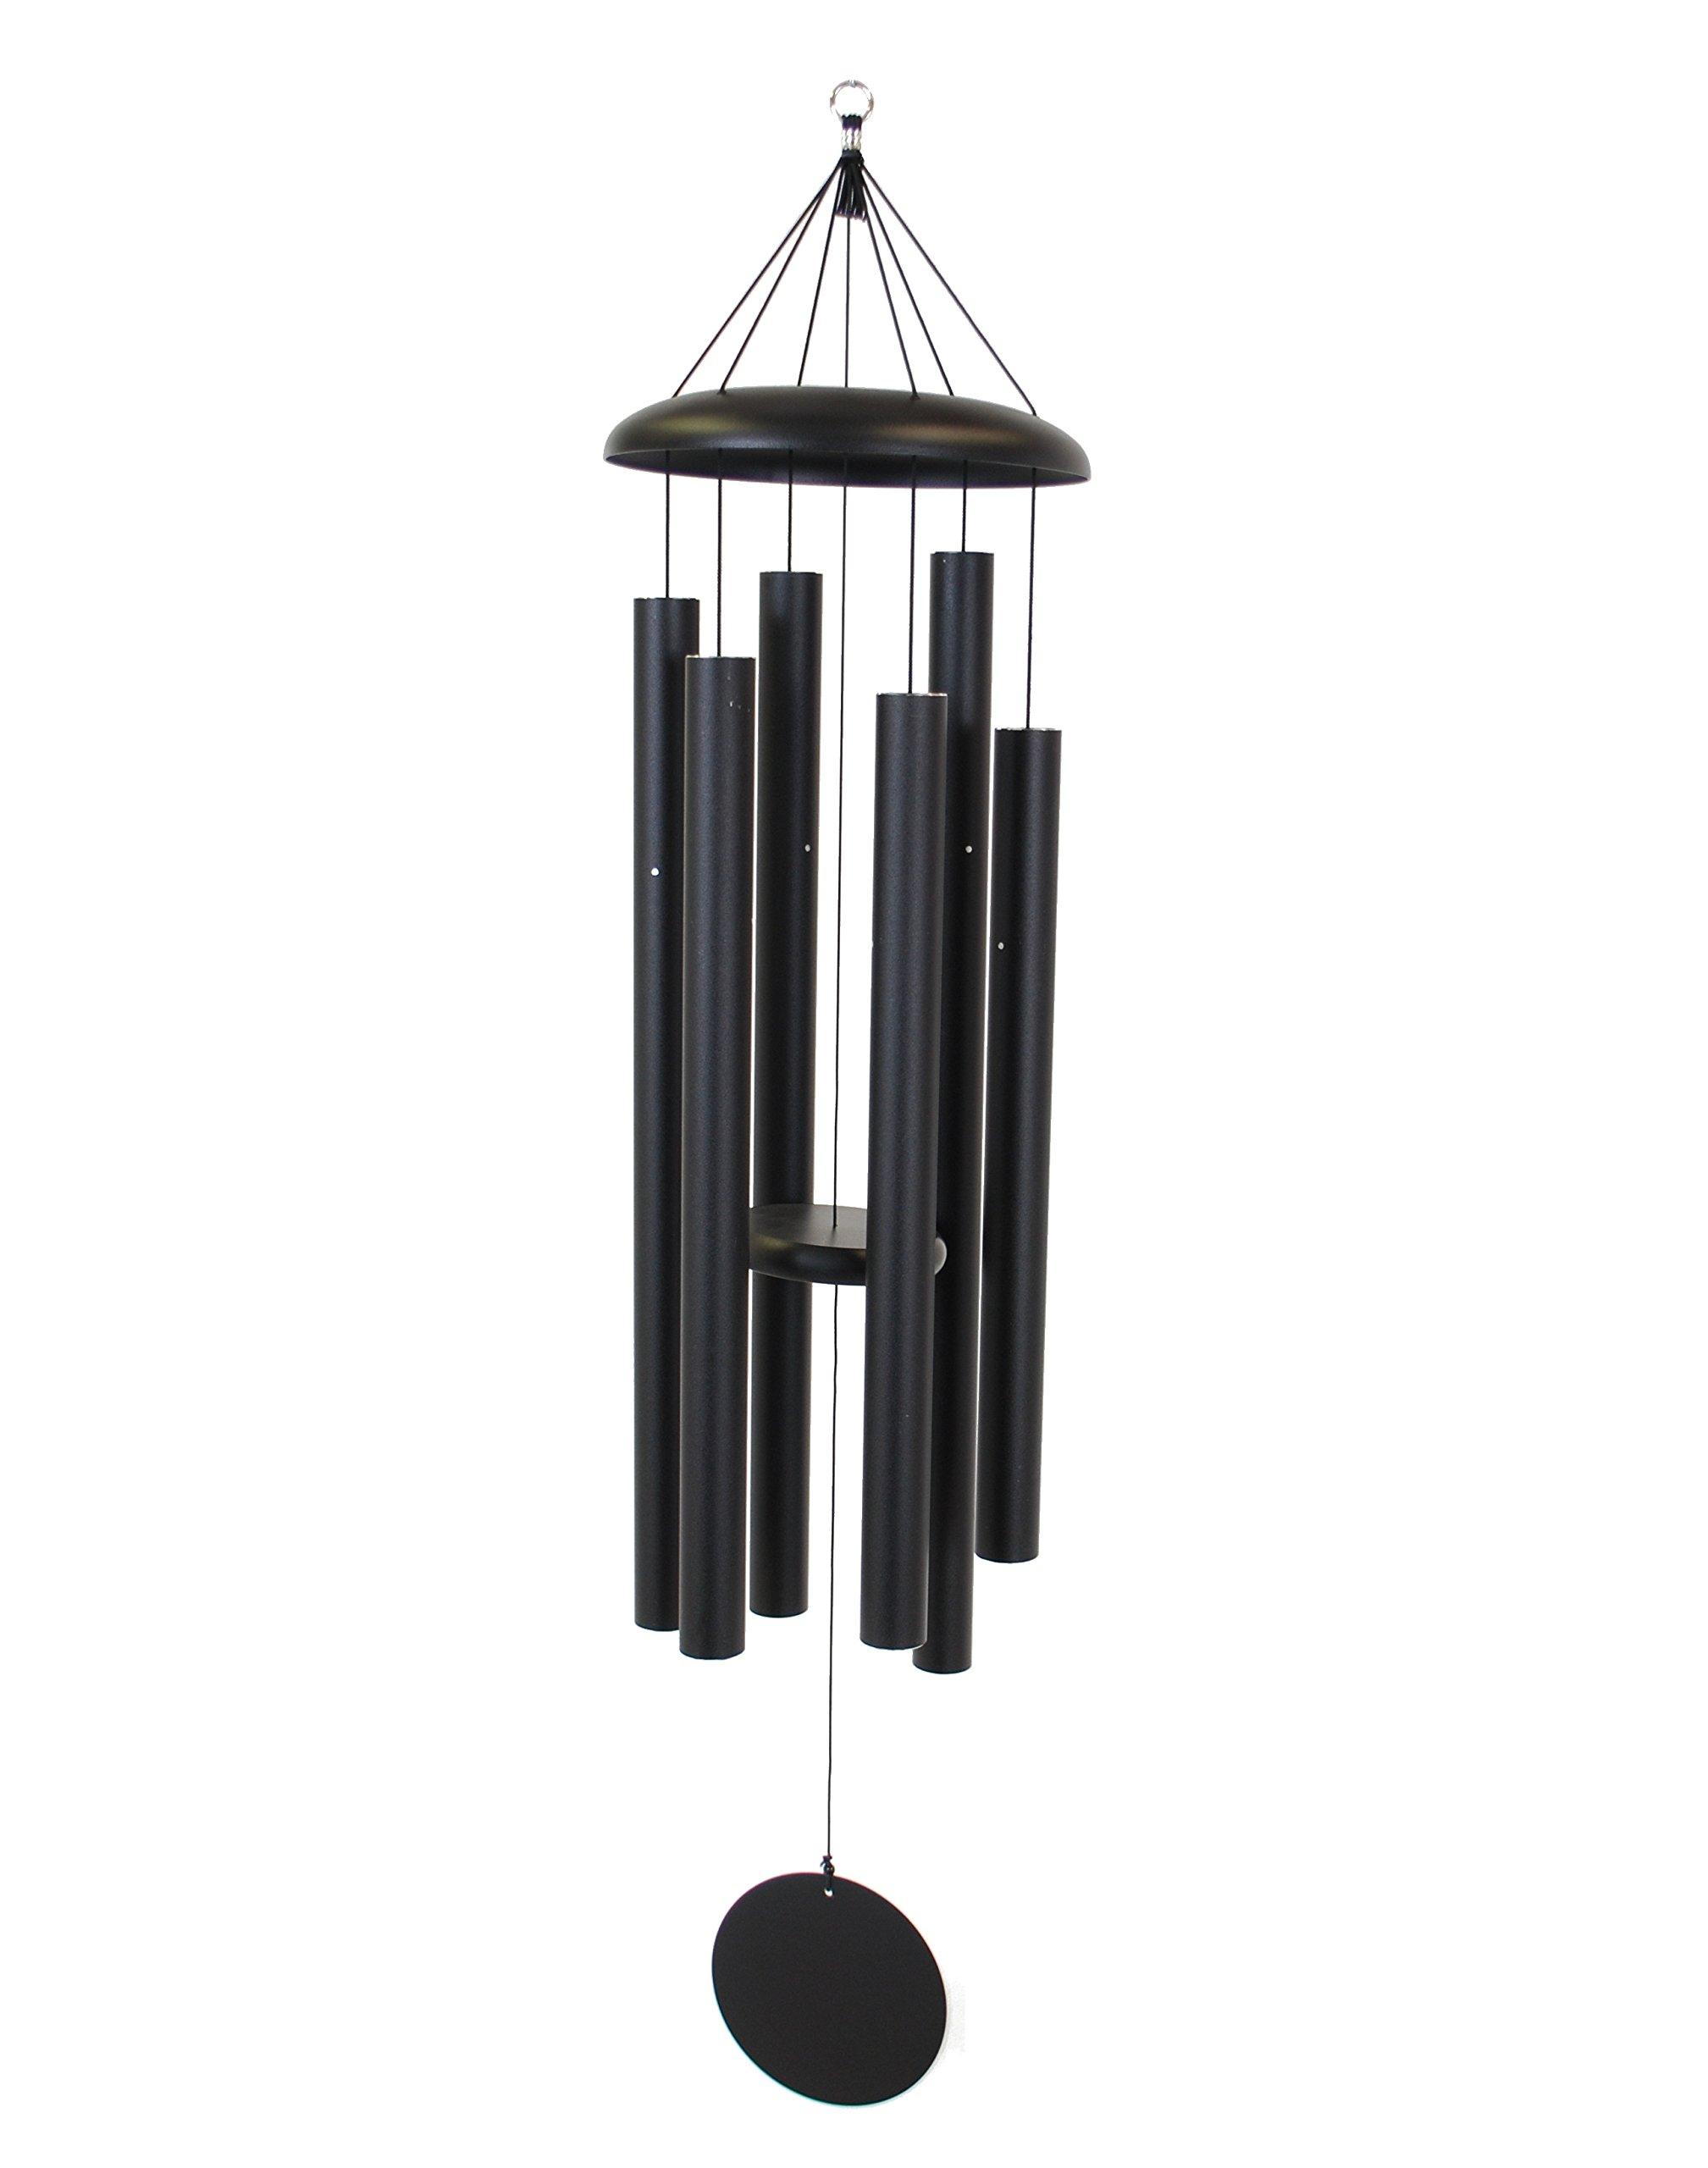 Corinthian Bells 53-inch Windchime, Black